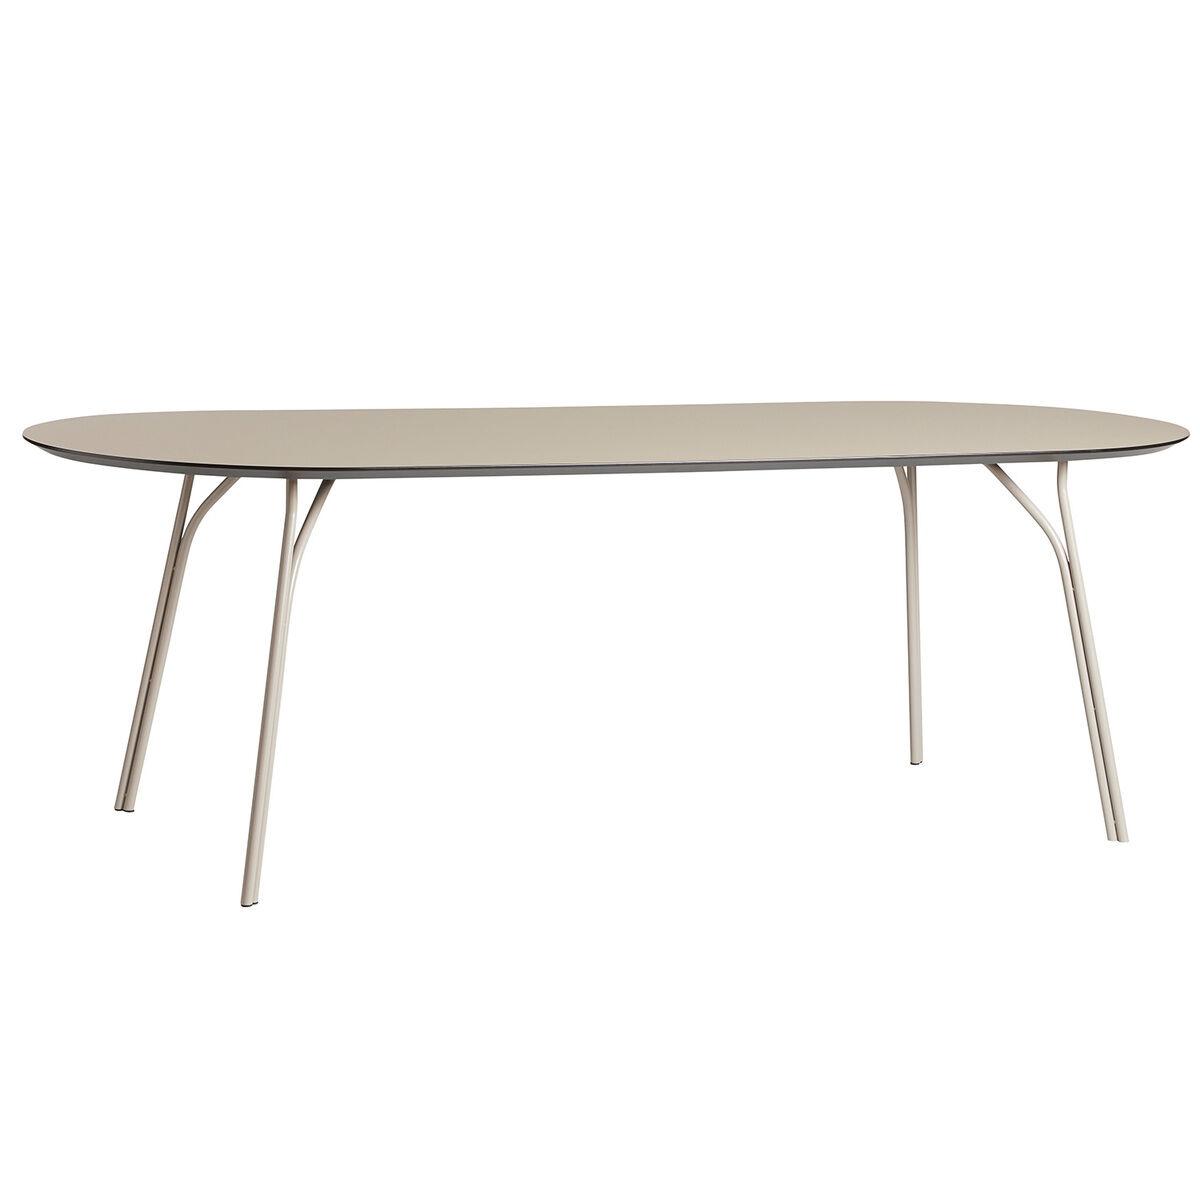 Woud Tree dining table, 220 x 90 cm, beige